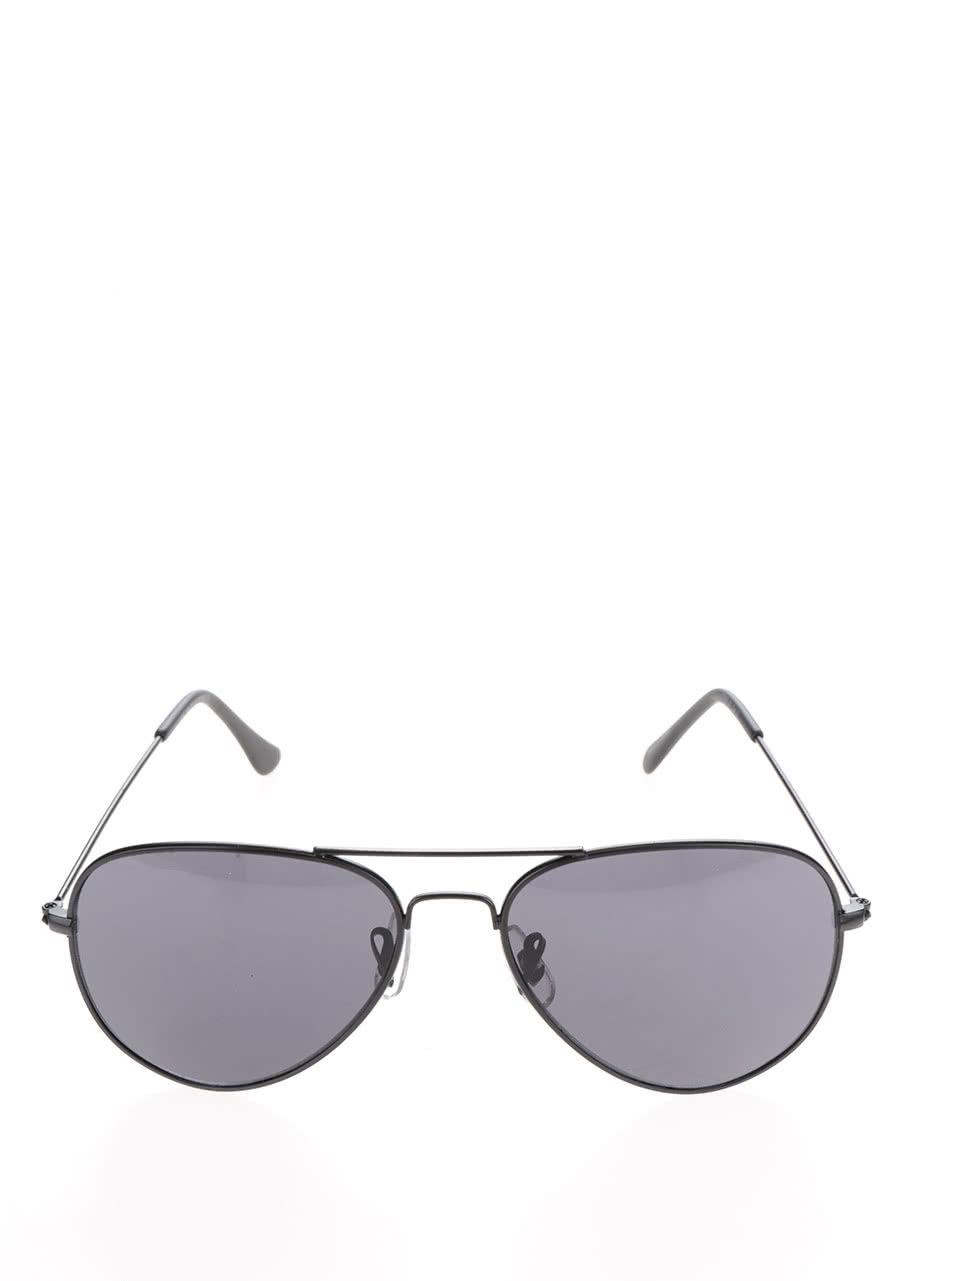 Čierne slnečné okuliare Jack   Jones Leo ... 341186993ab